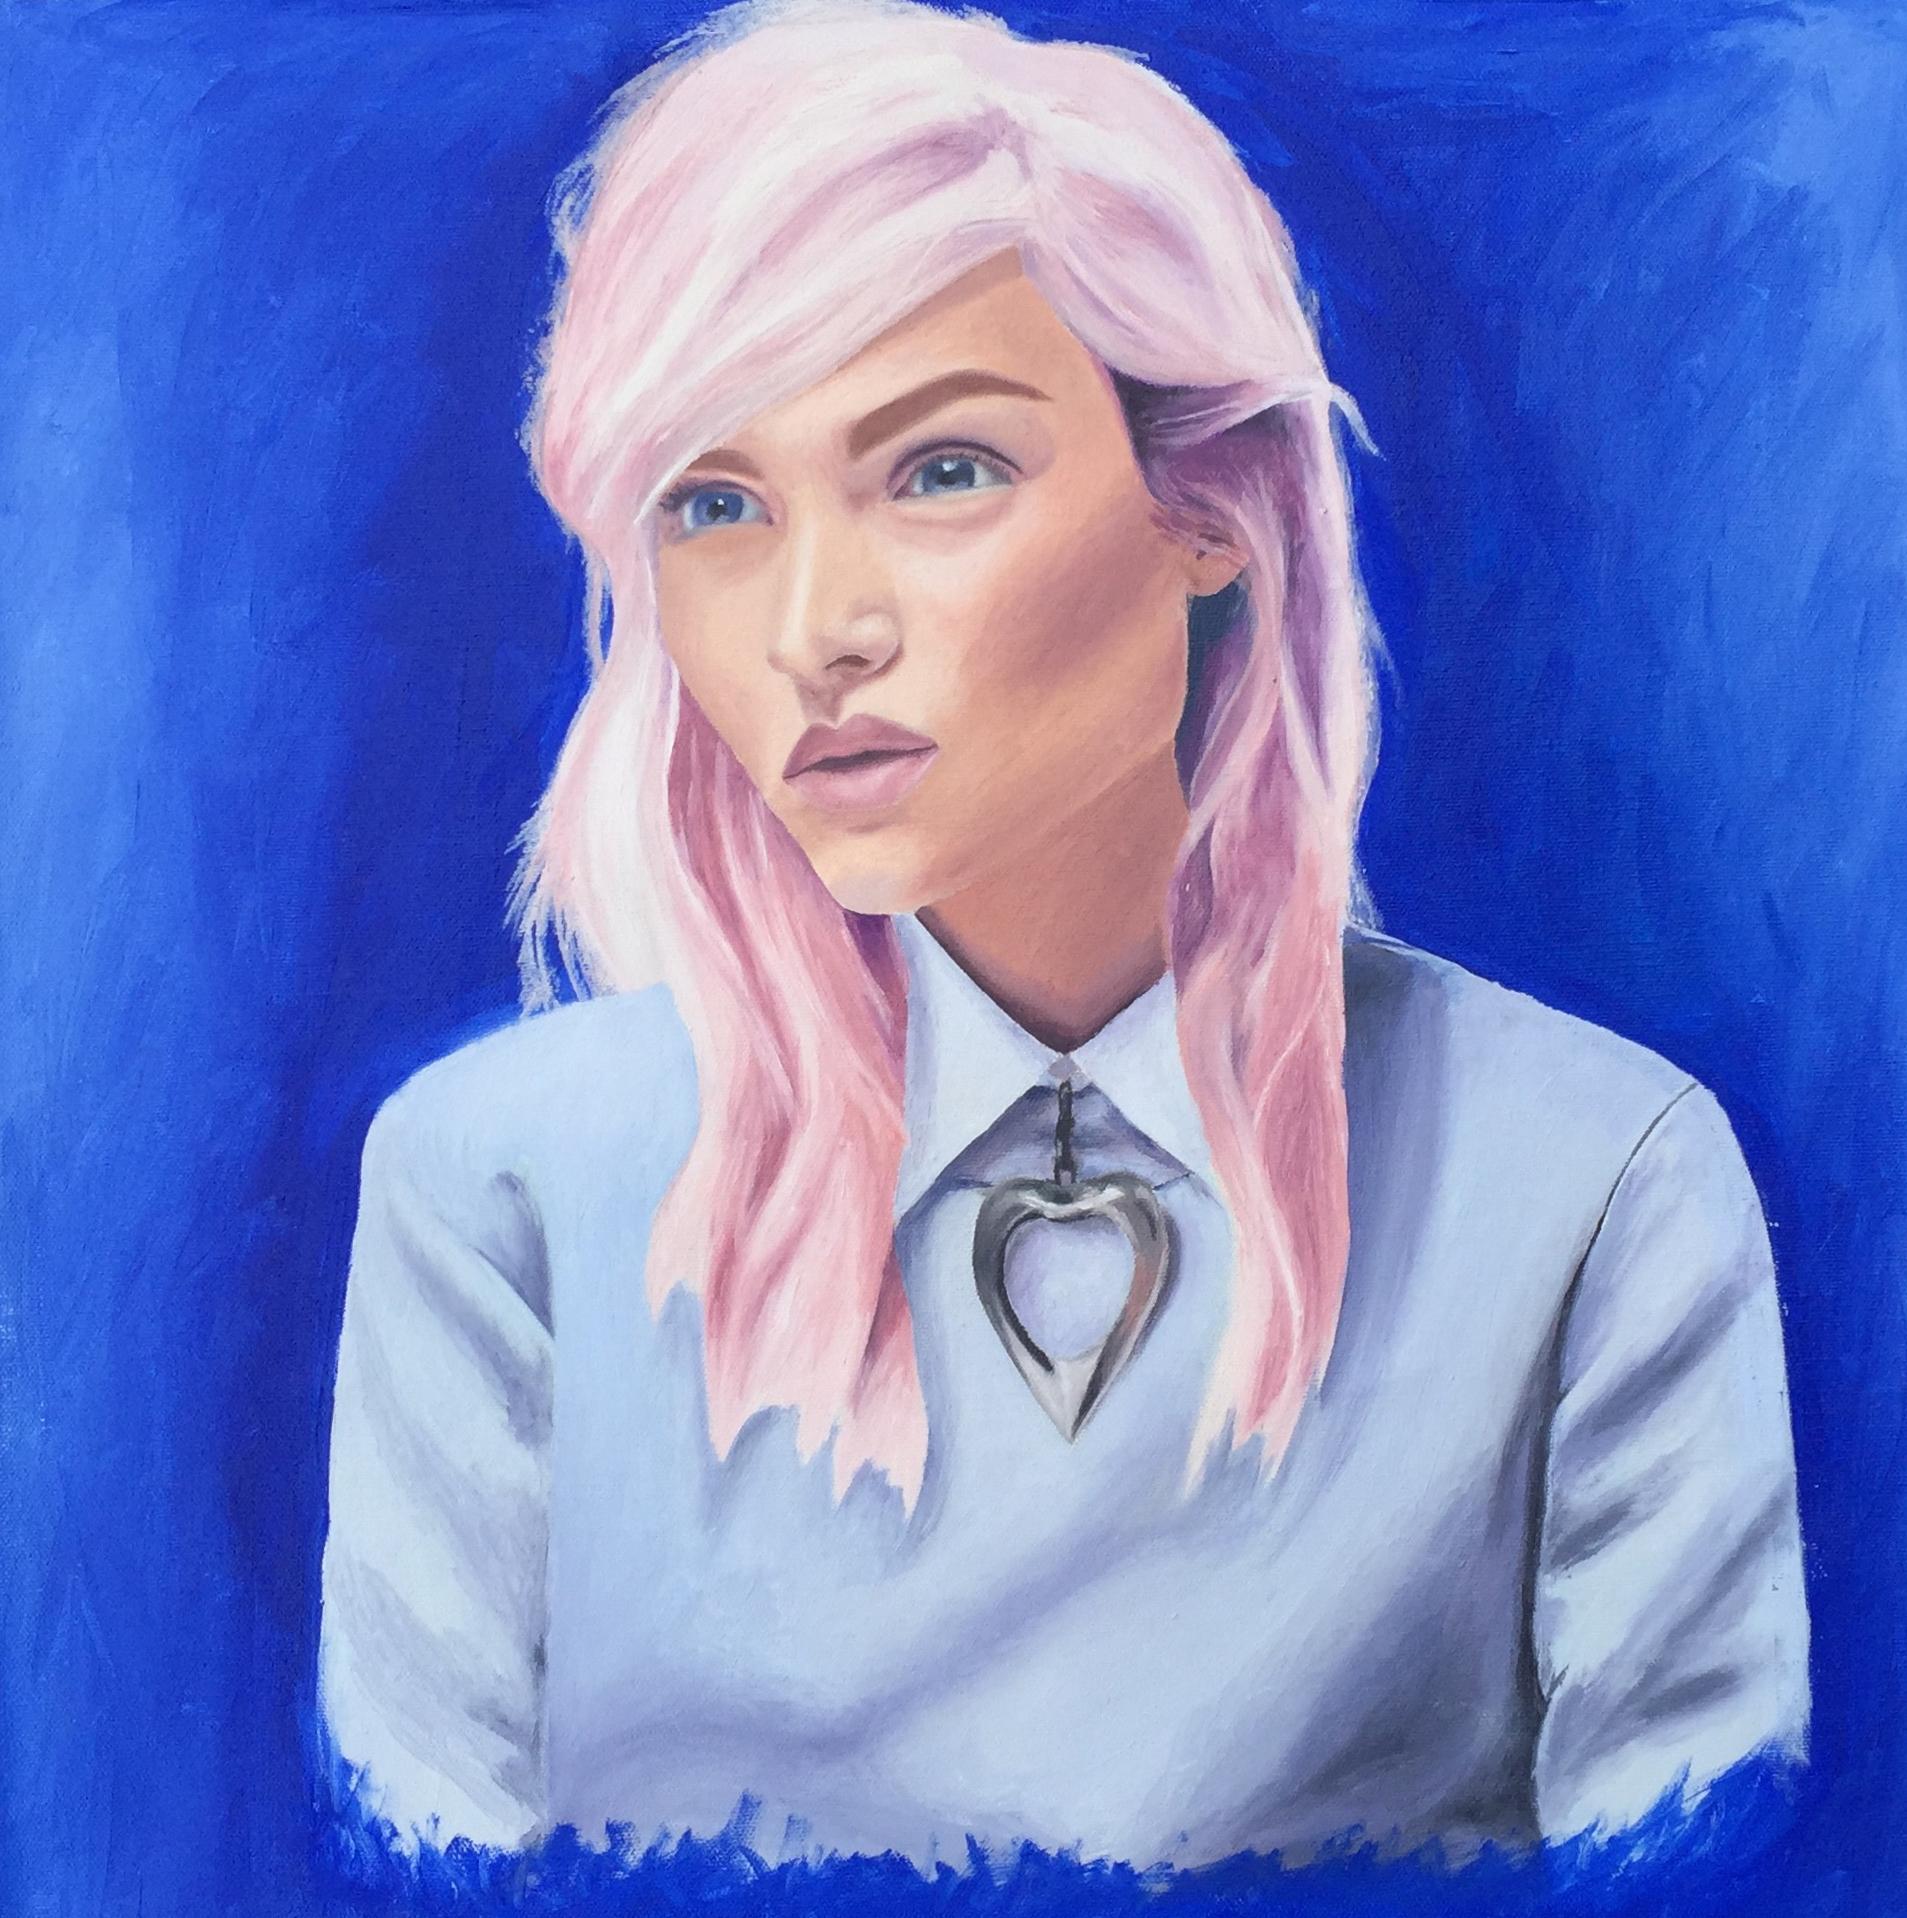 portrait_pink hair.jpeg